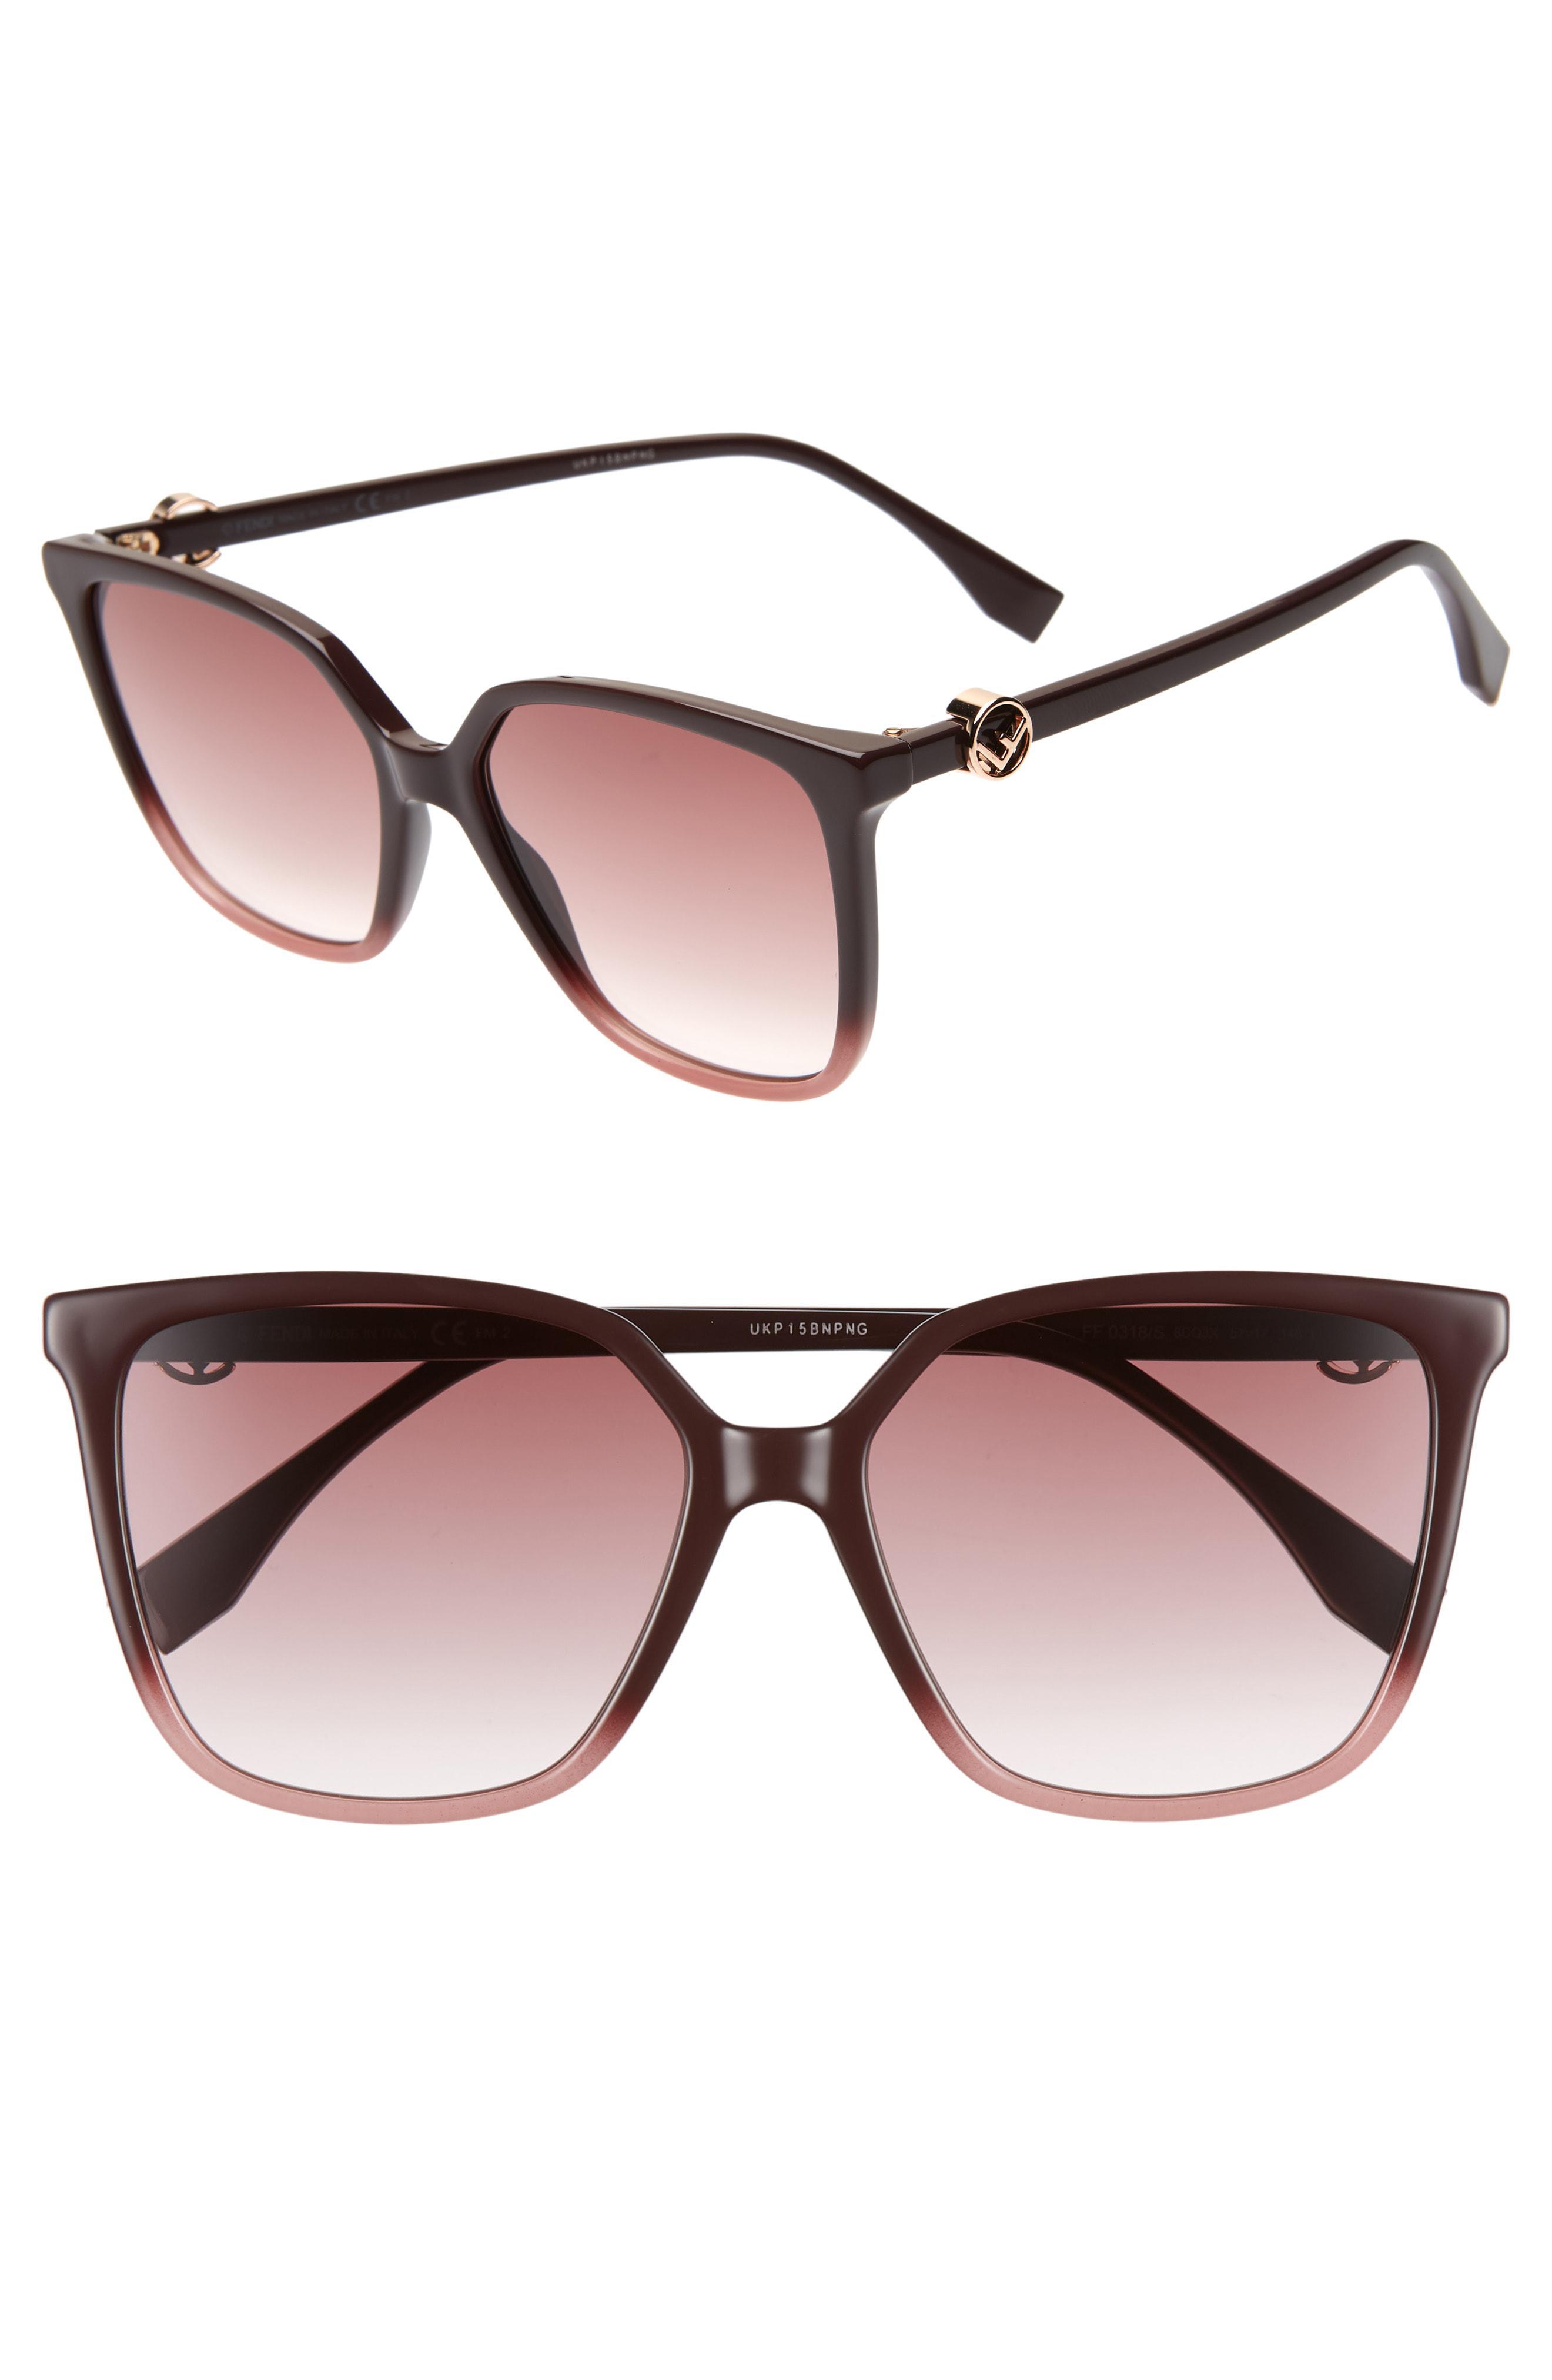 ffd65c7aff8 Lyst - Fendi 57mm Sunglasses - Cherry in Brown